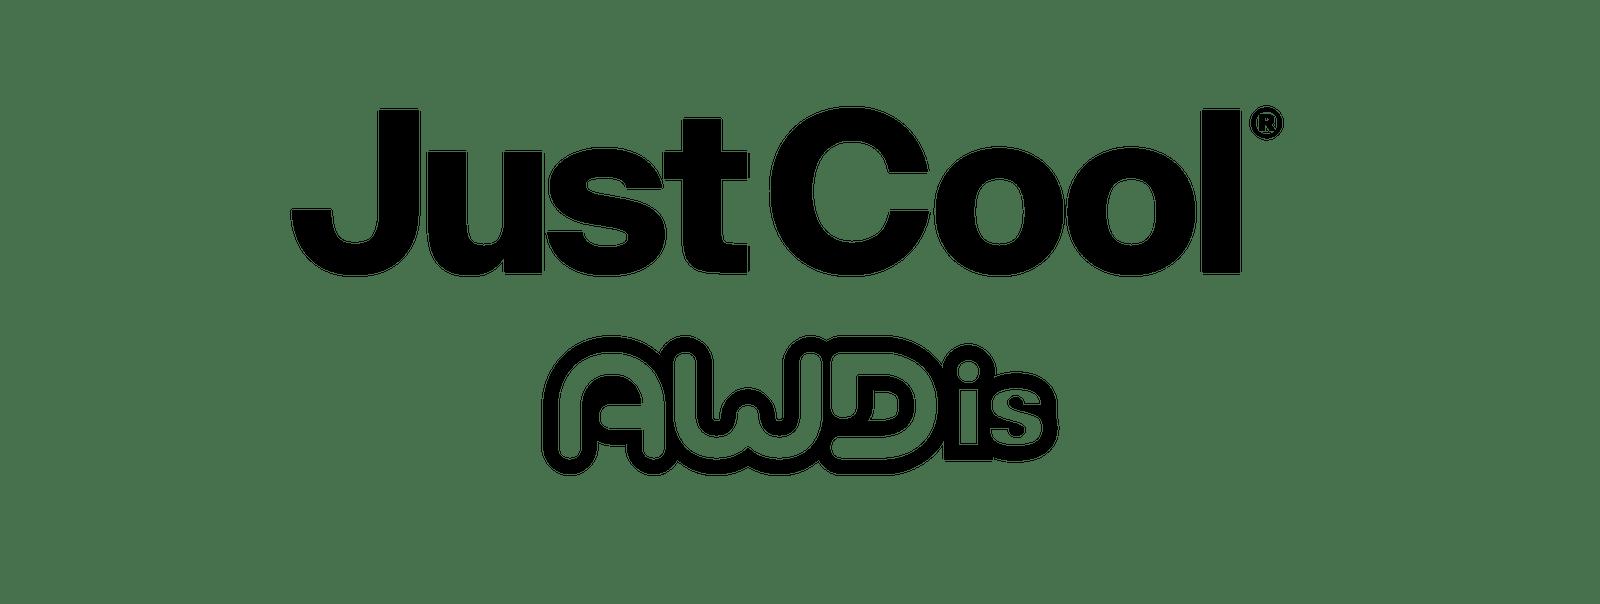 Just Cool (11 proizvoda)